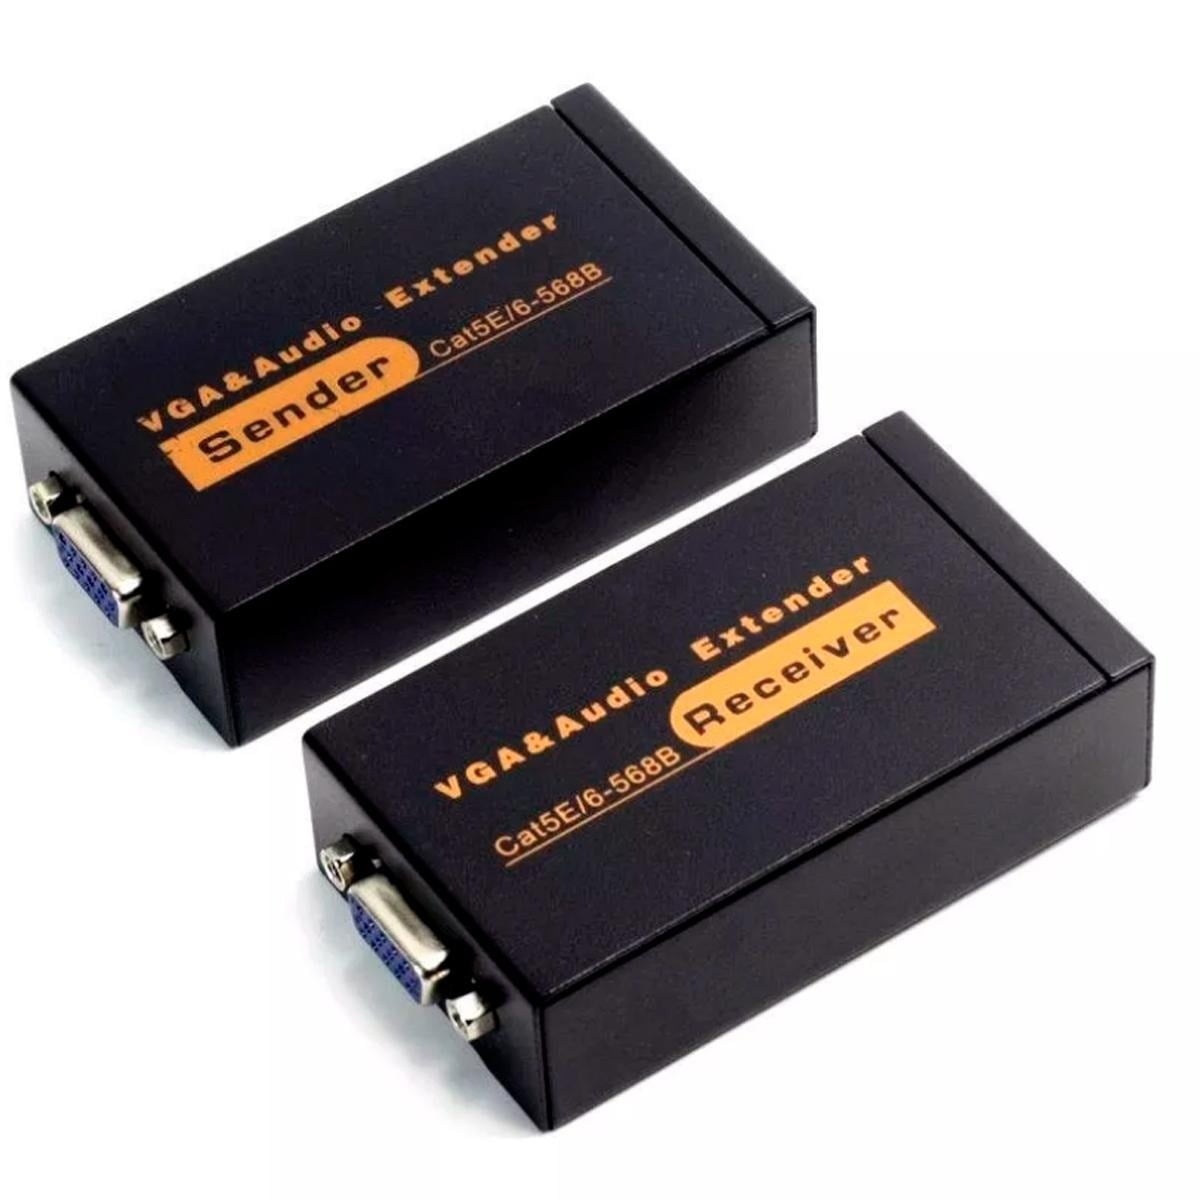 Extensor VGA 100 metros - HW-EXV100M